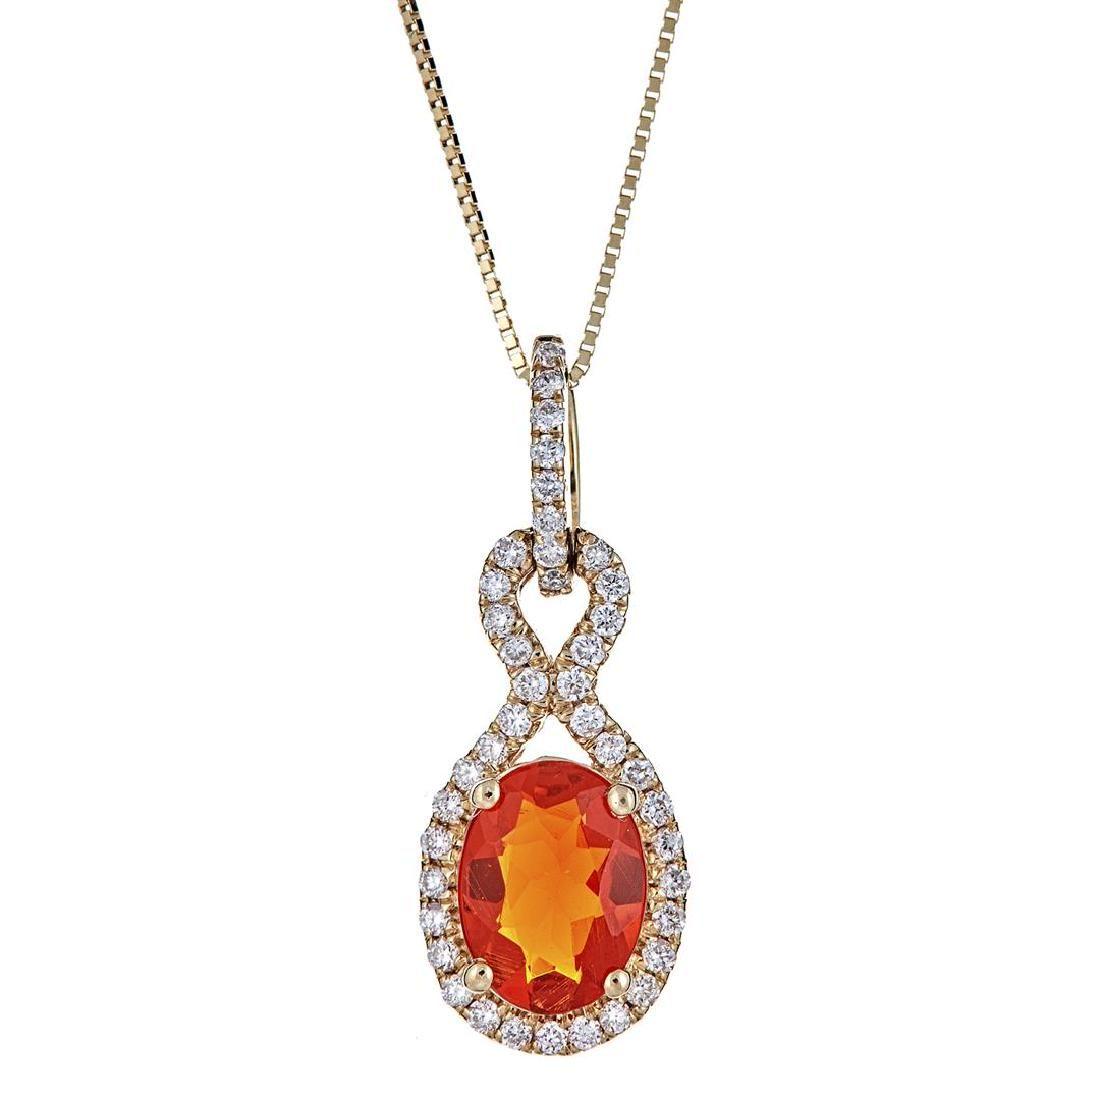 0.77 ctw Fire Opal and Diamond Pendant - 14KT Yellow